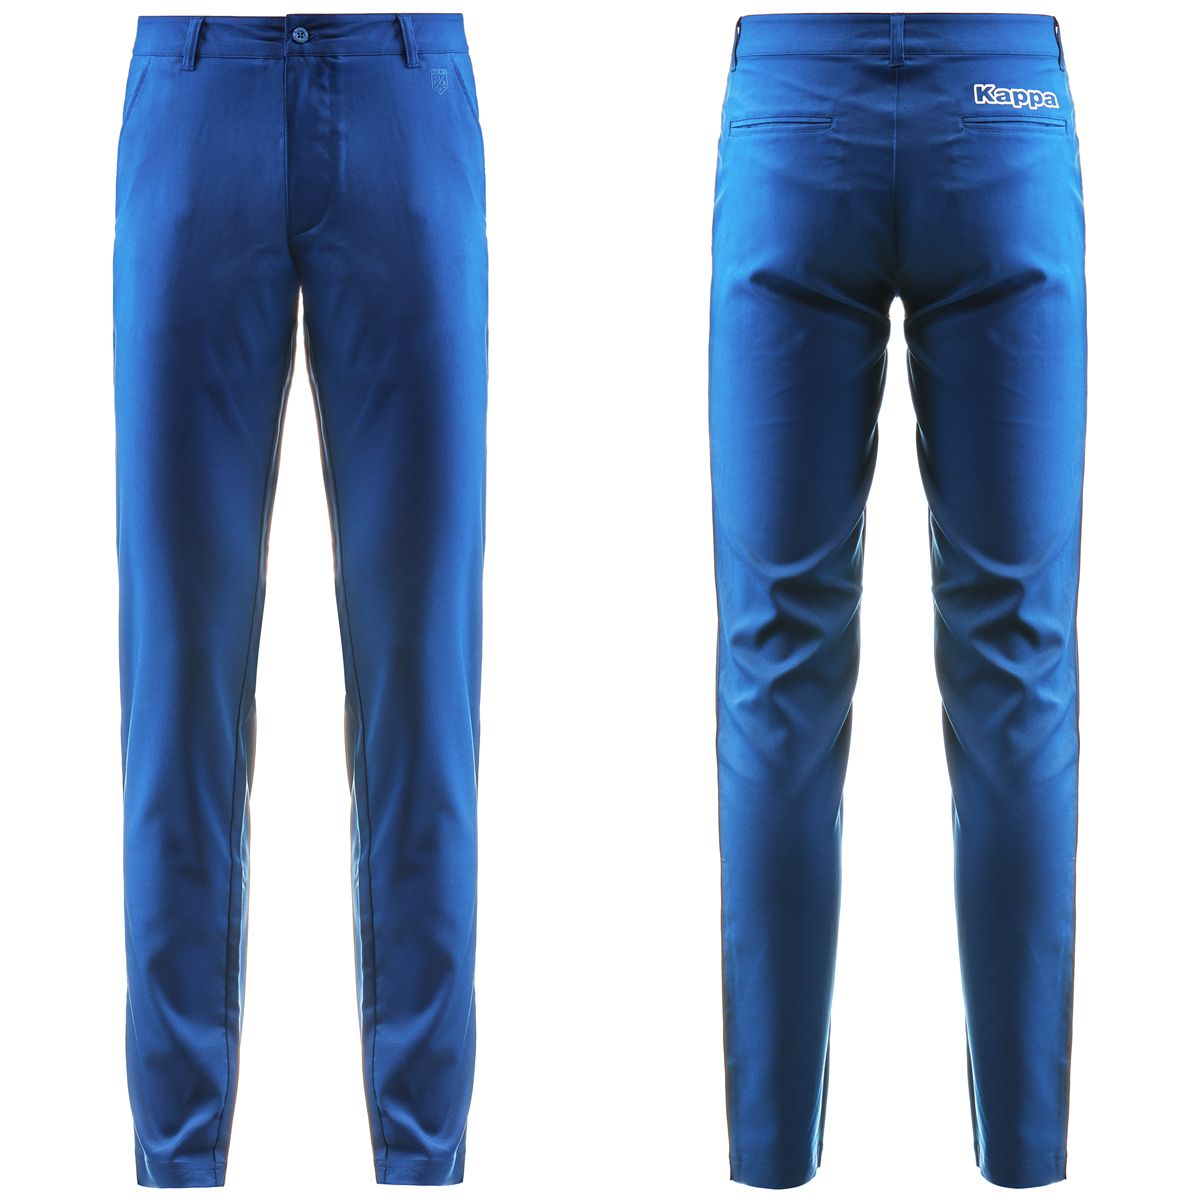 Kappa Pantaloni uomo-3026MK0